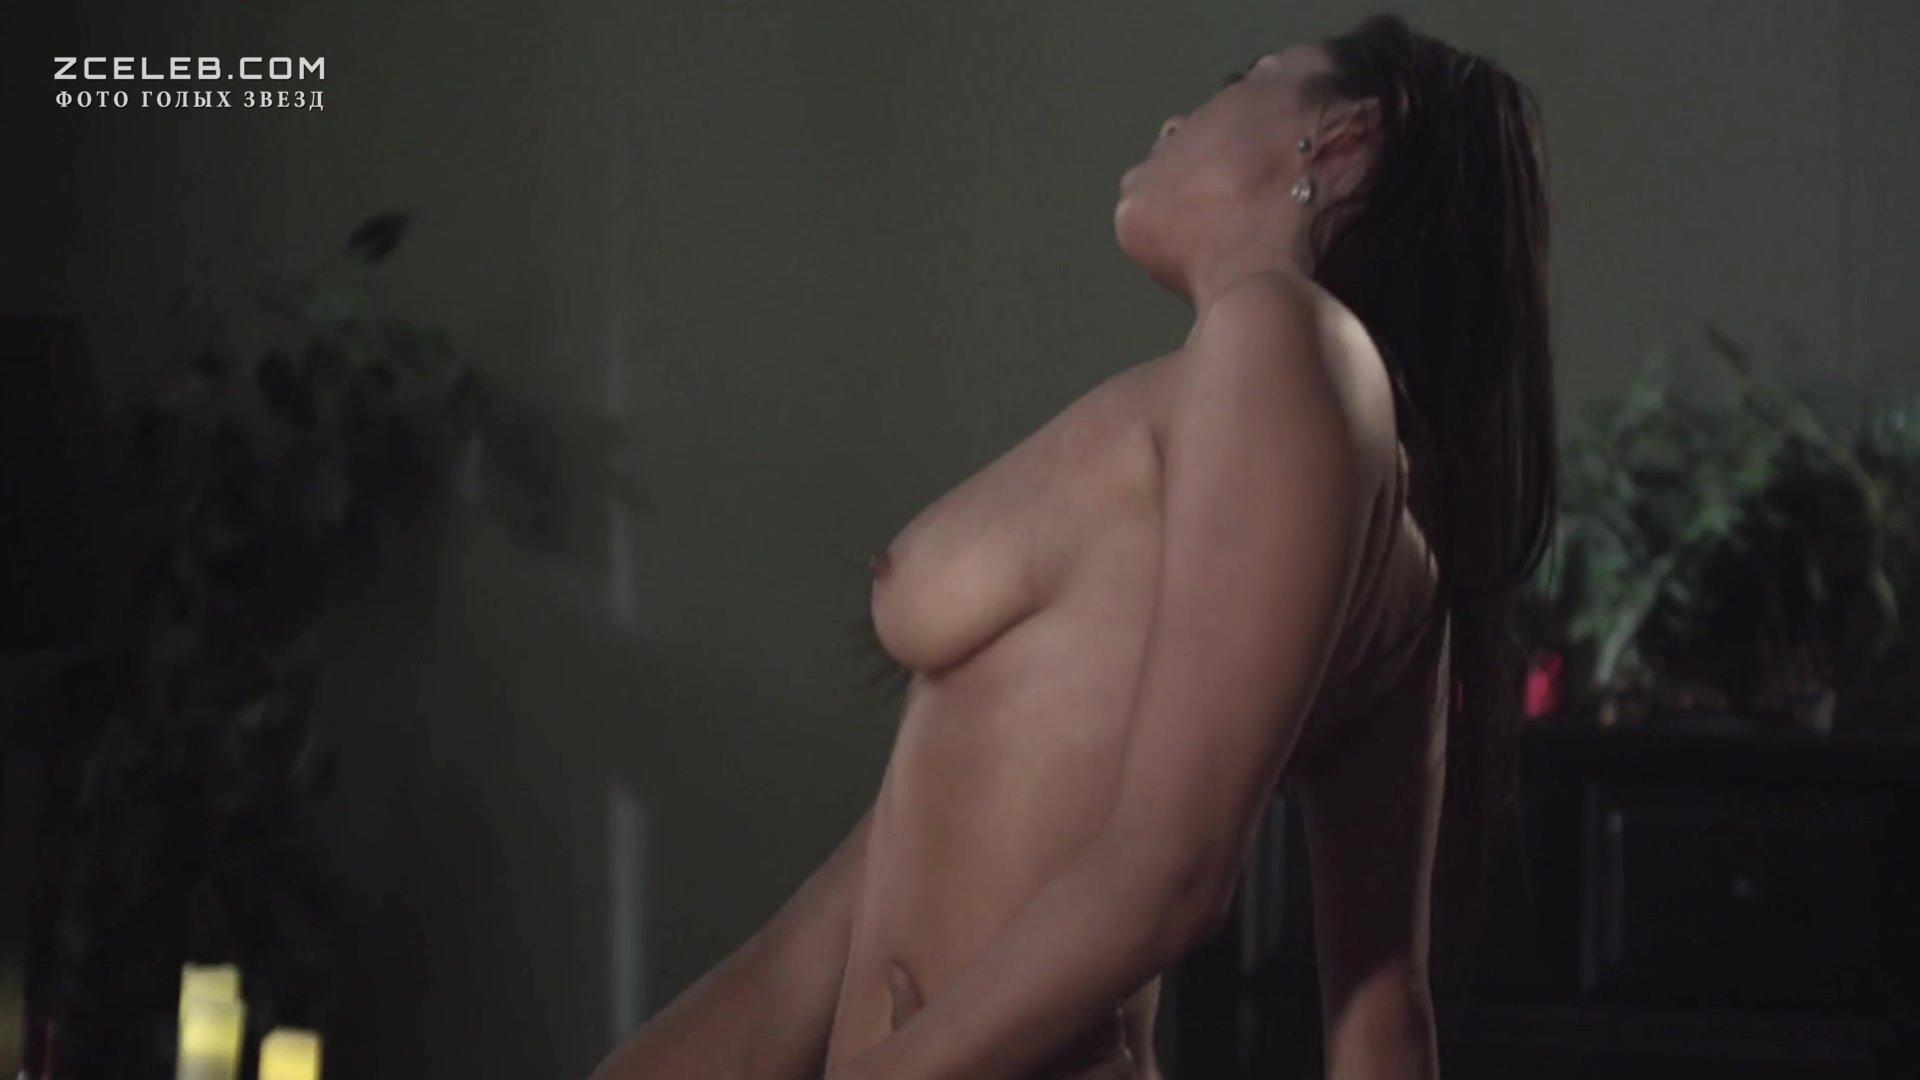 Lena headey nude shows her hairy pussy